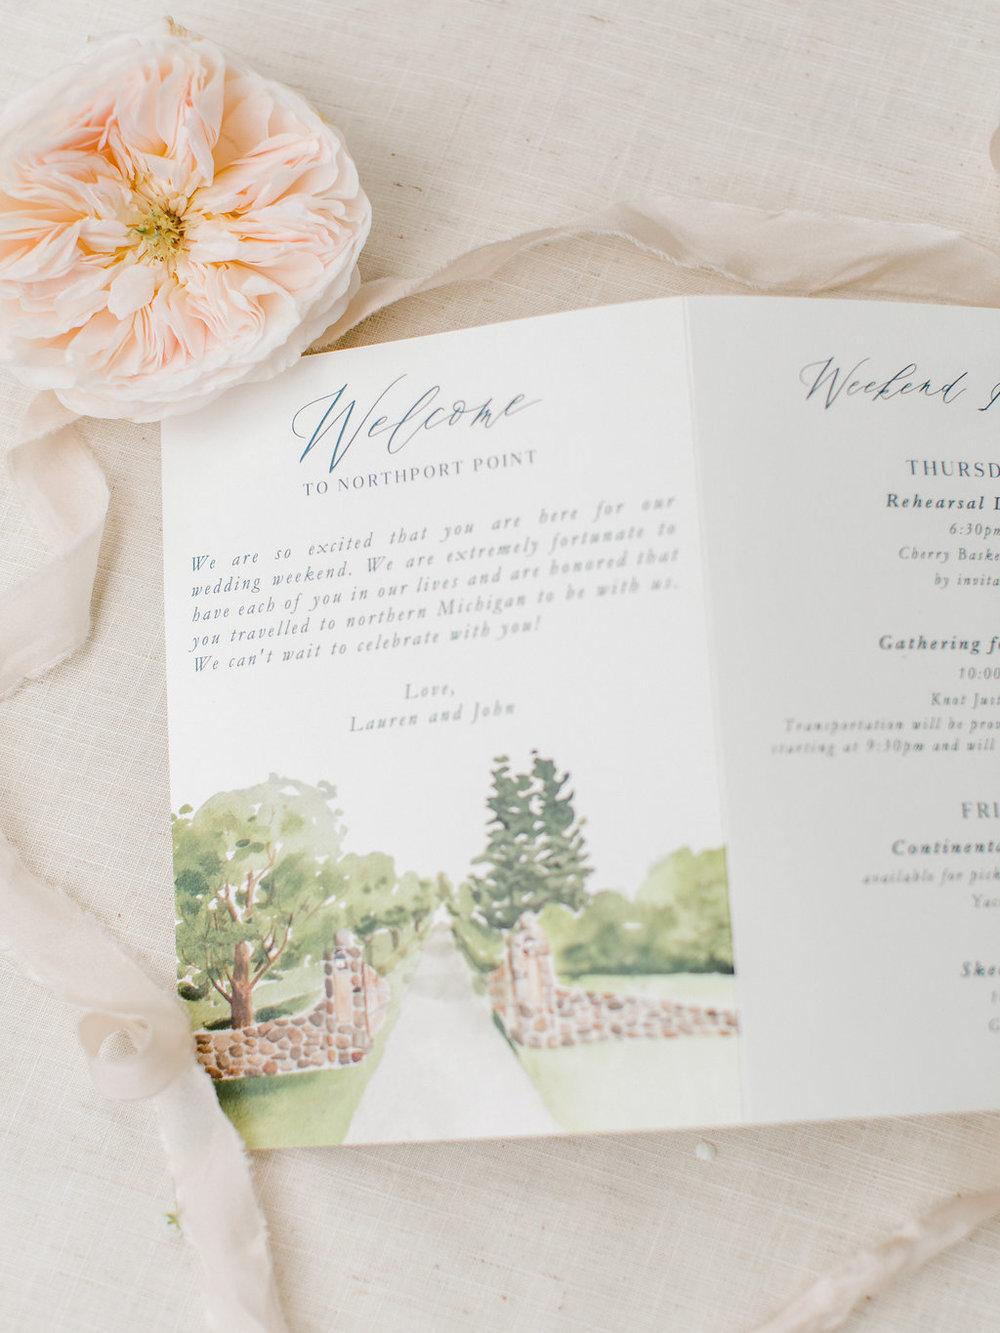 Coffman+Wedding+Details-18.jpg